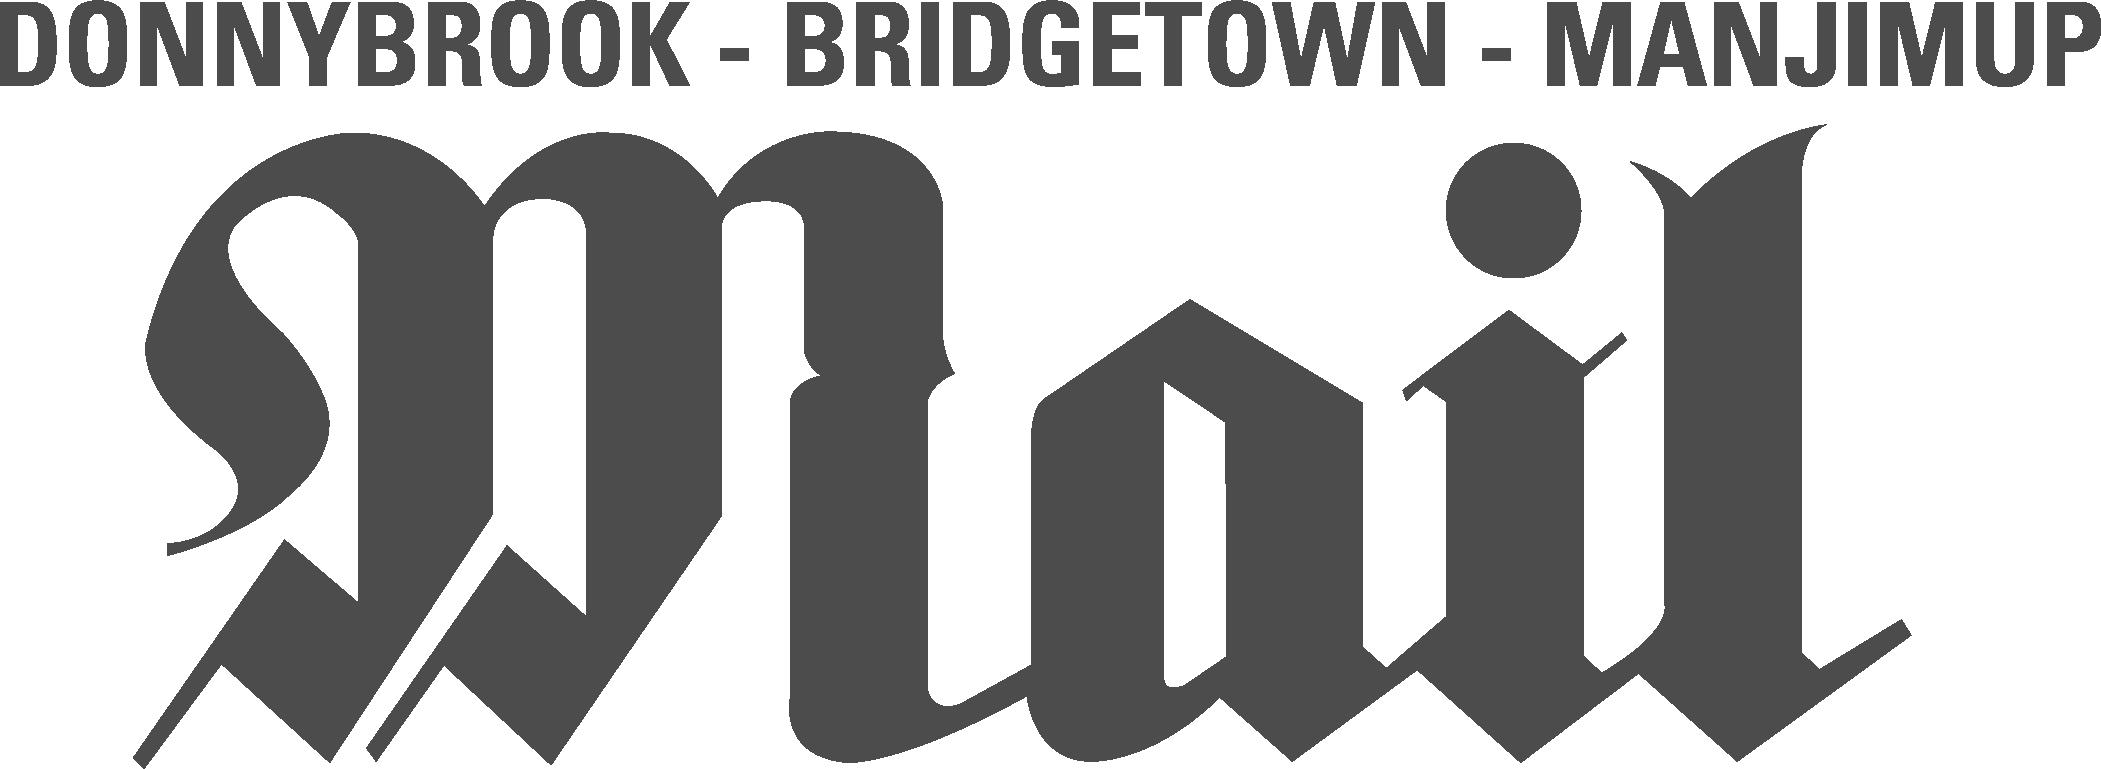 Donnybrook-Bridgetown Mail